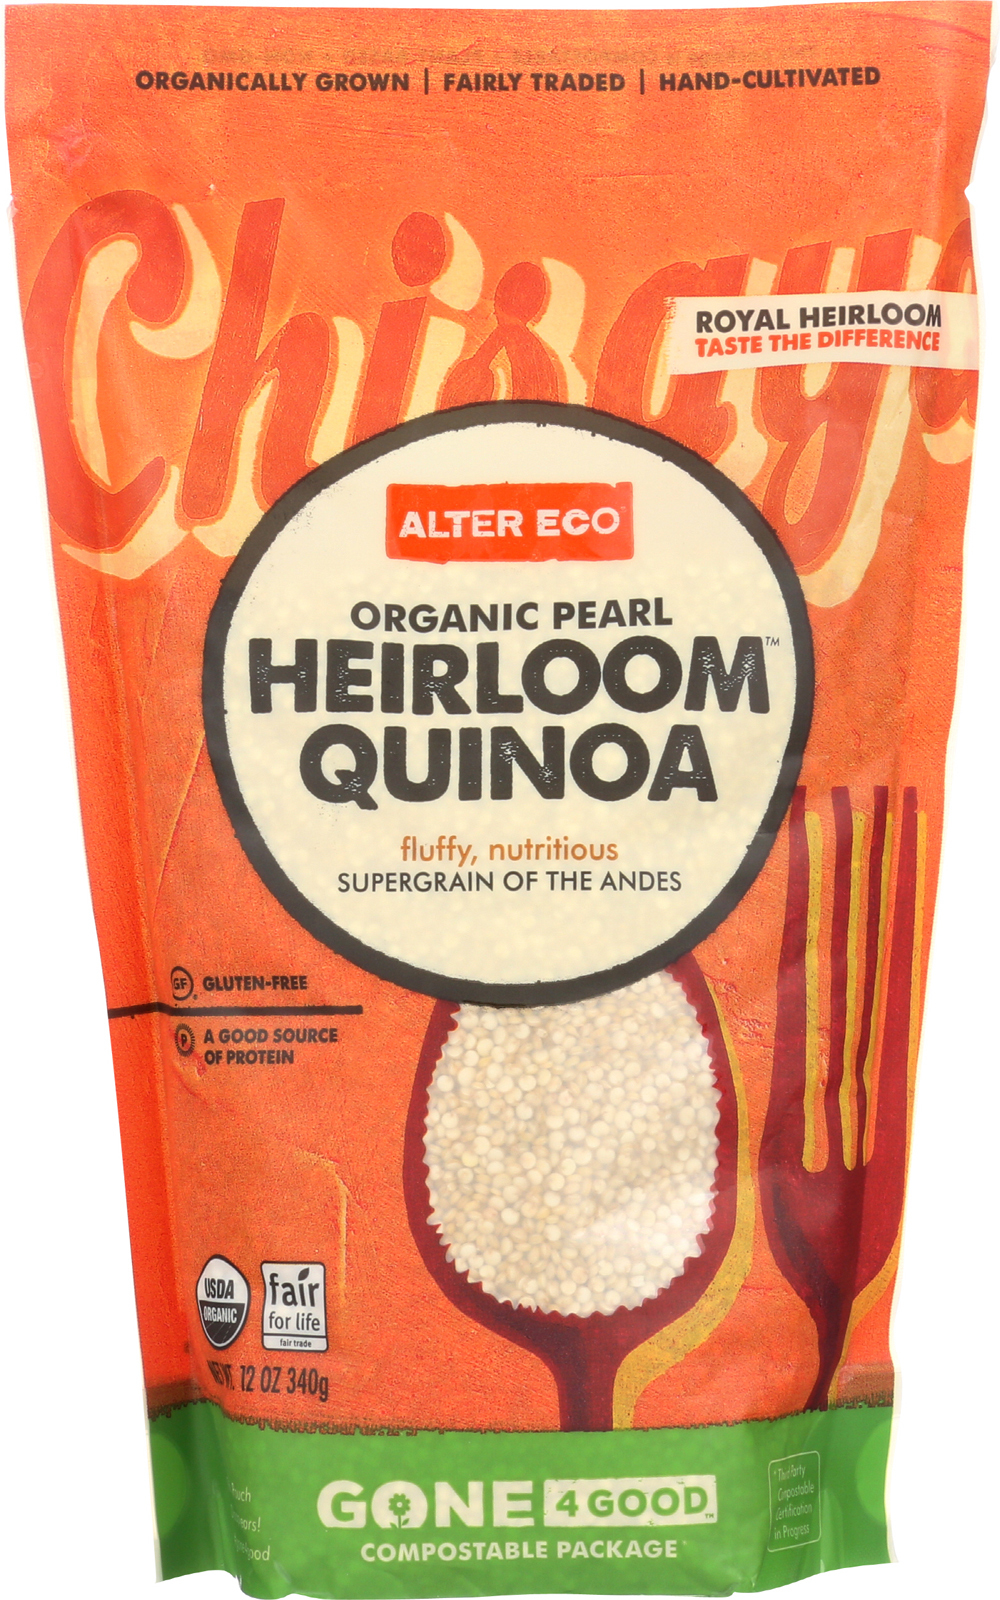 Alter Eco Americas Quinoa - Organic Pearl Heirloom - Case of 6 - 12 oz.